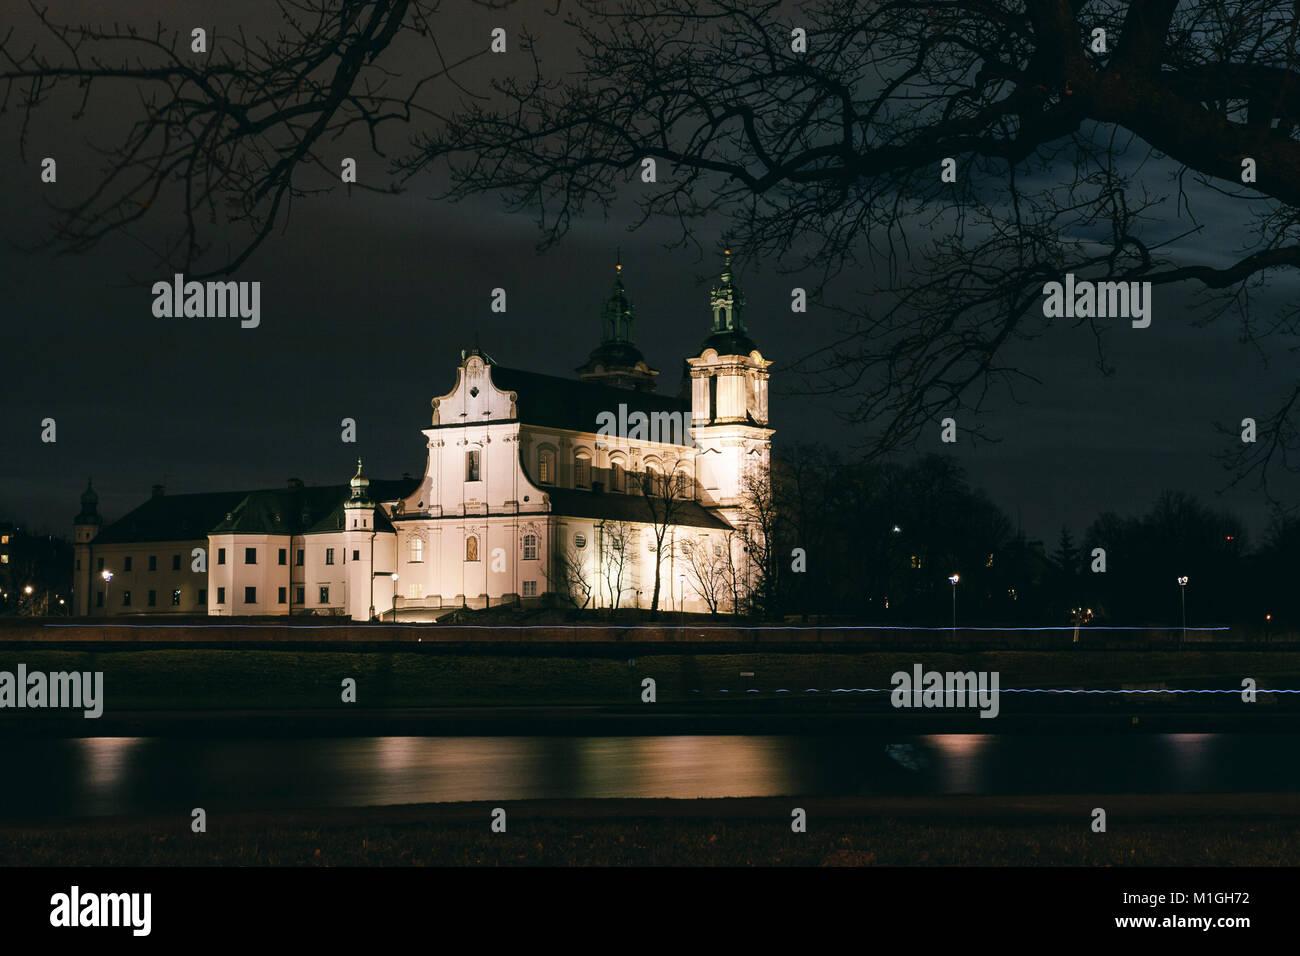 Na Skałce Church in Krakow, Poland reflected in the river Vistula at night - Stock Image